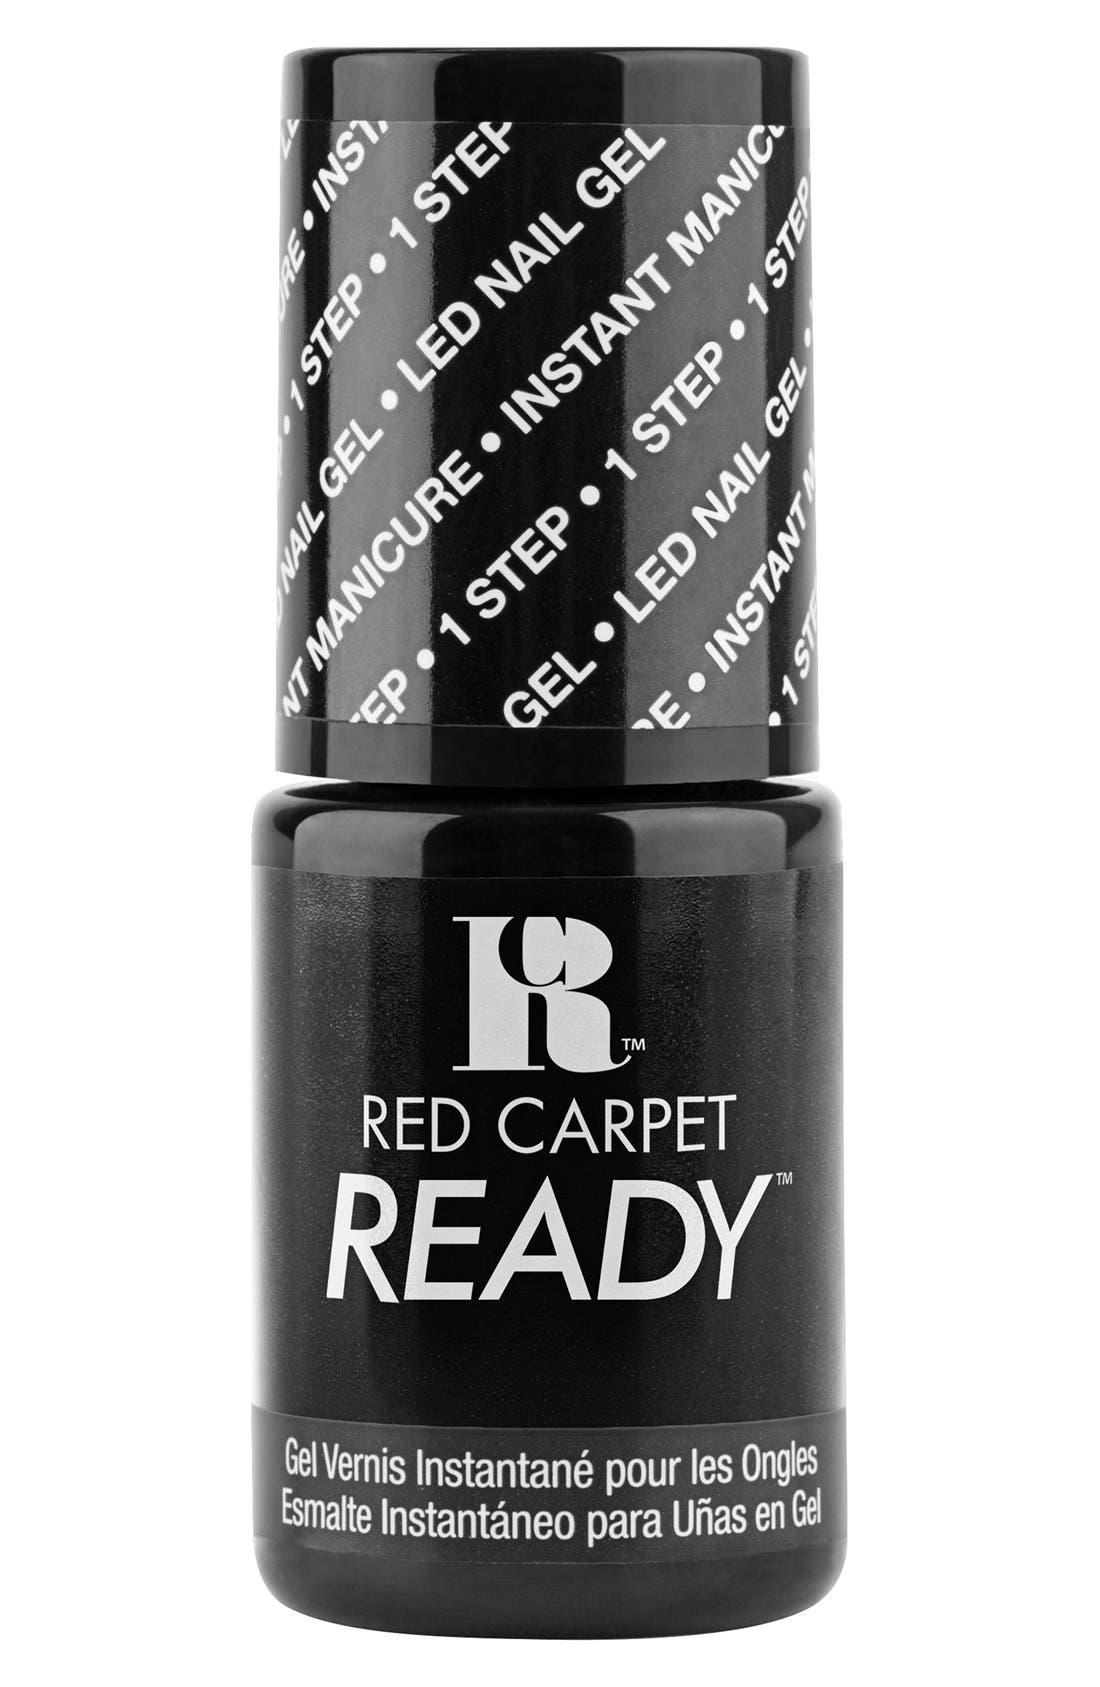 Red Carpet Manicure 'Red Carpet Ready' LED Nail Gel Polish